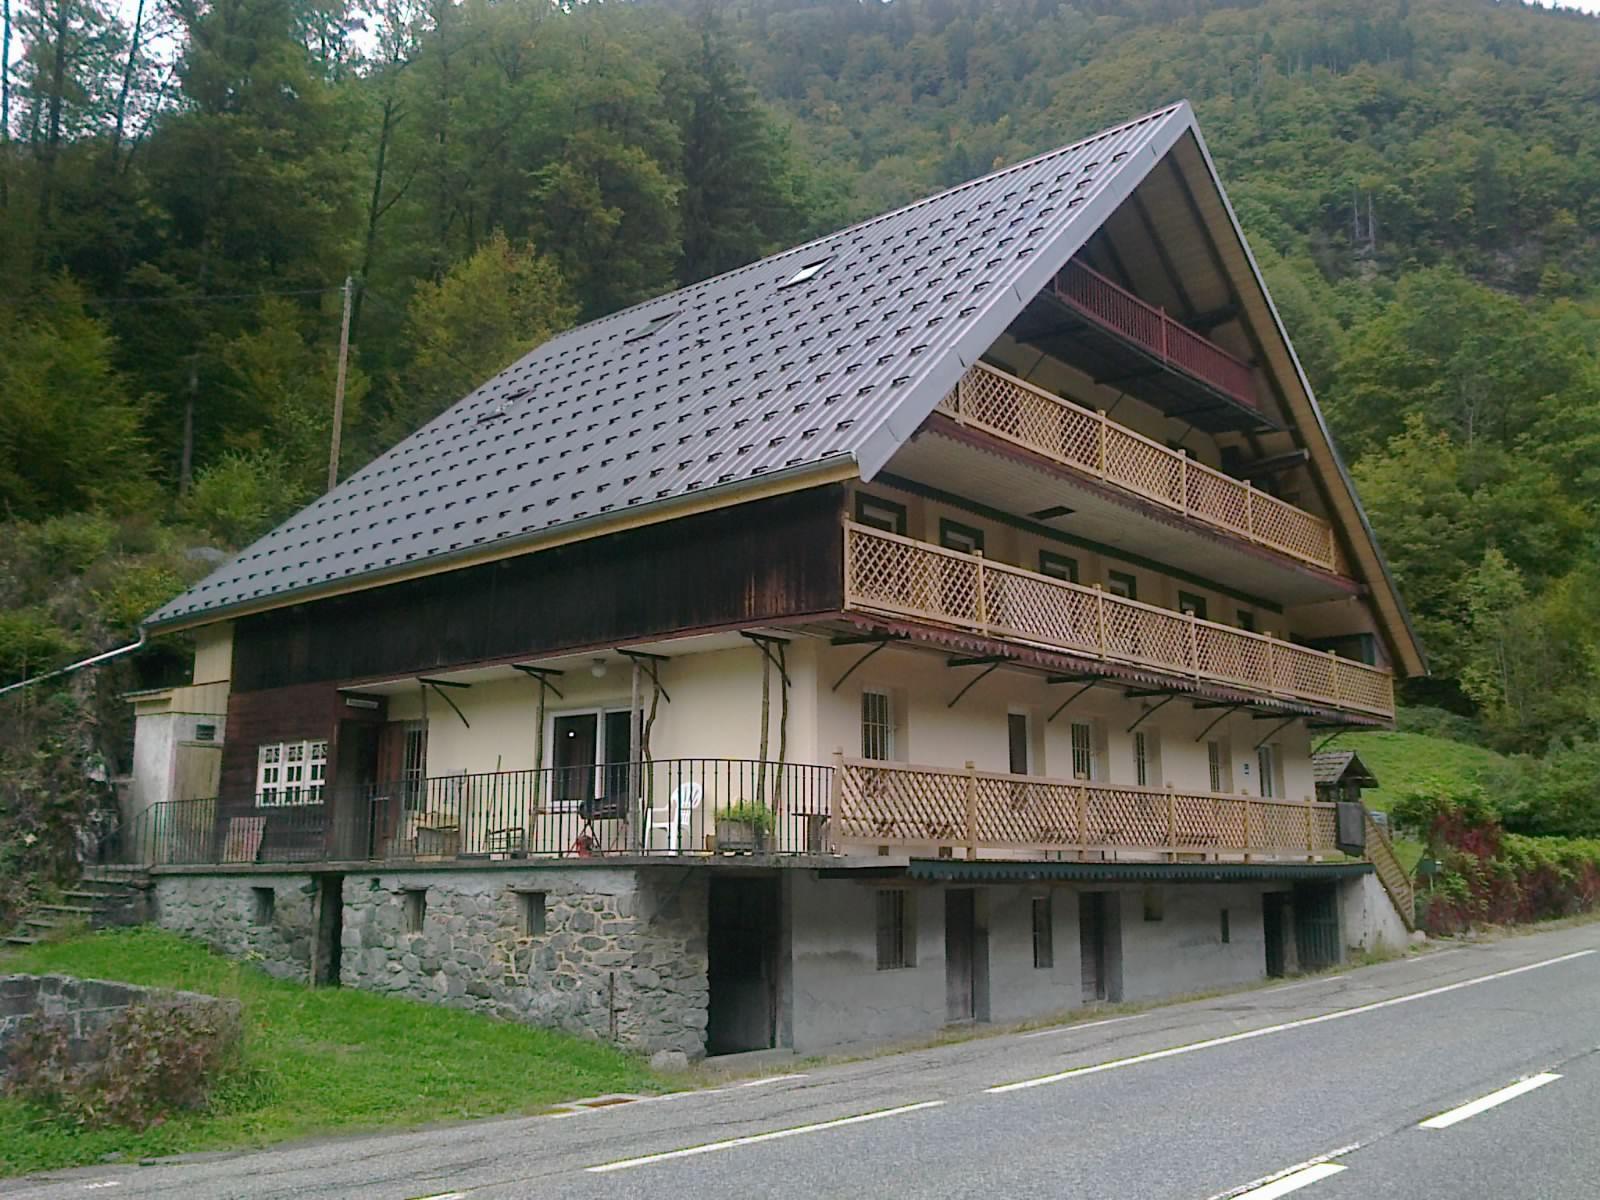 Auberge toiture terminé